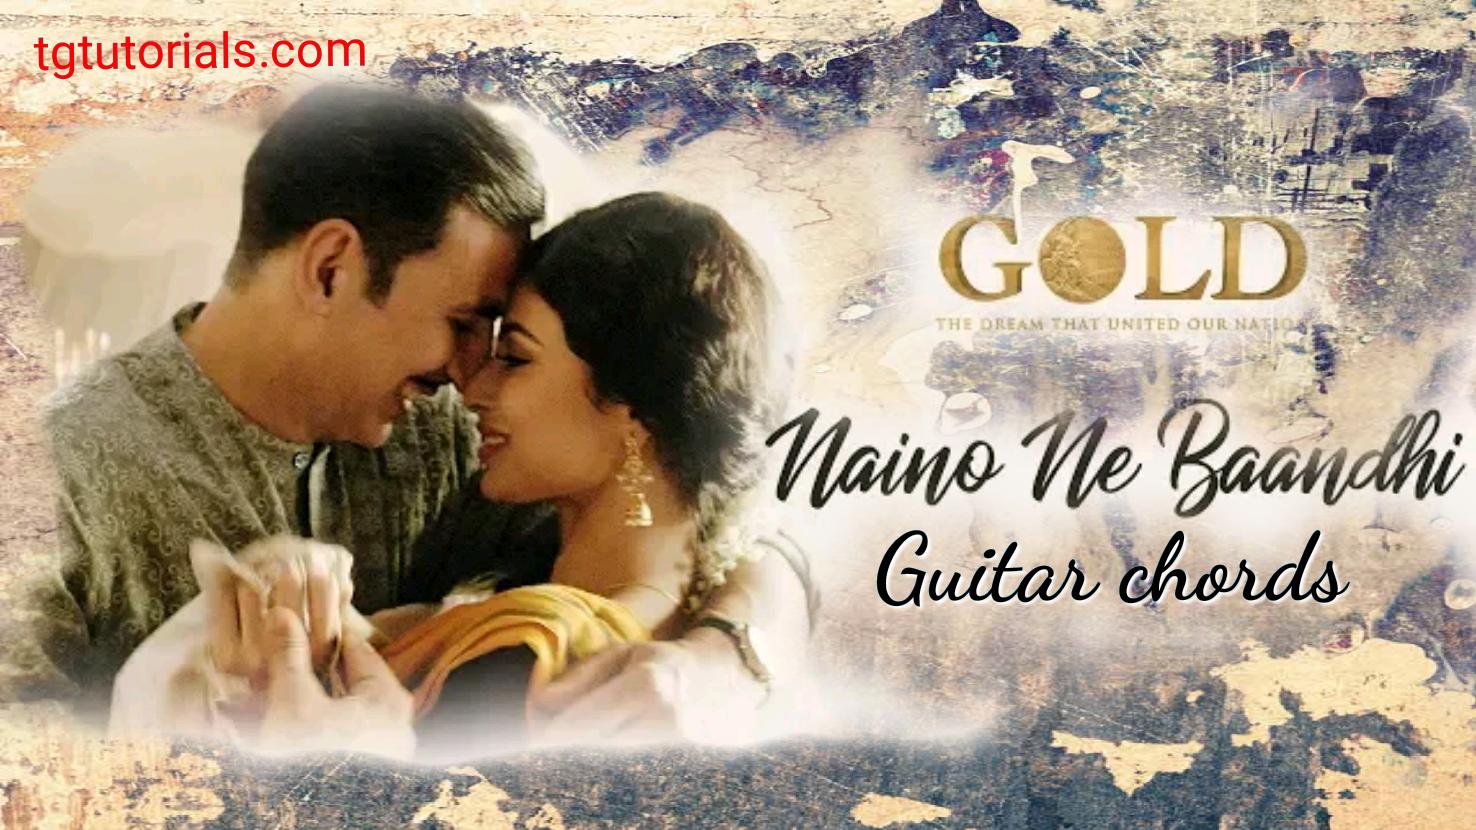 Naino Ne Baandhi Gold Yesser Desai Guitar Chords Tgtutorials